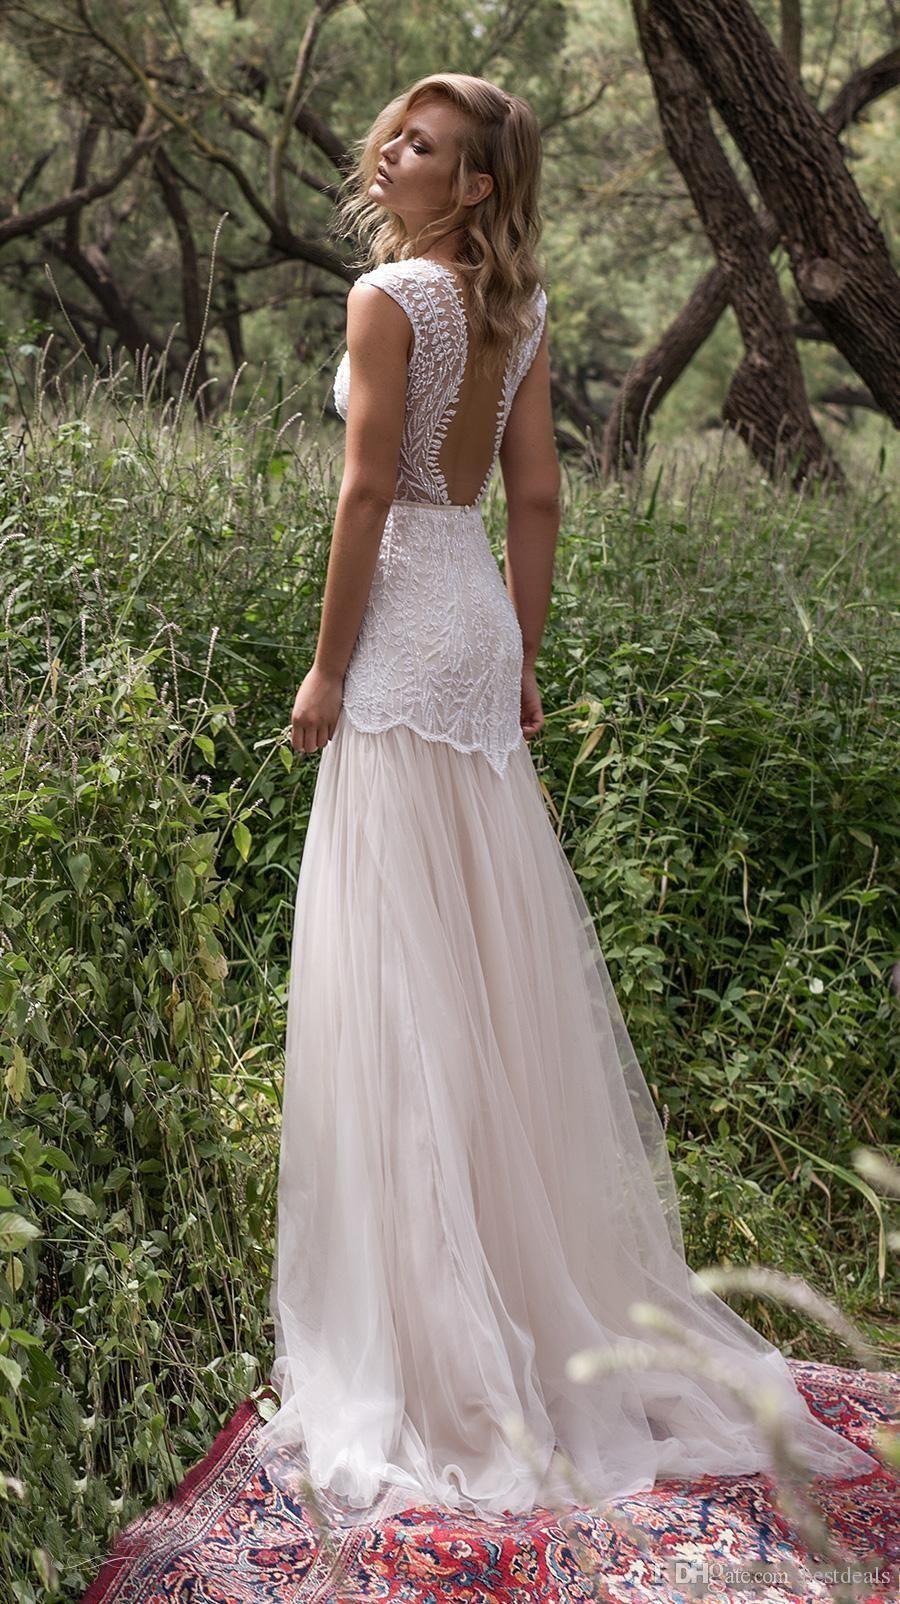 Limor rosen country wedding dresses illusion bodice jewel cap